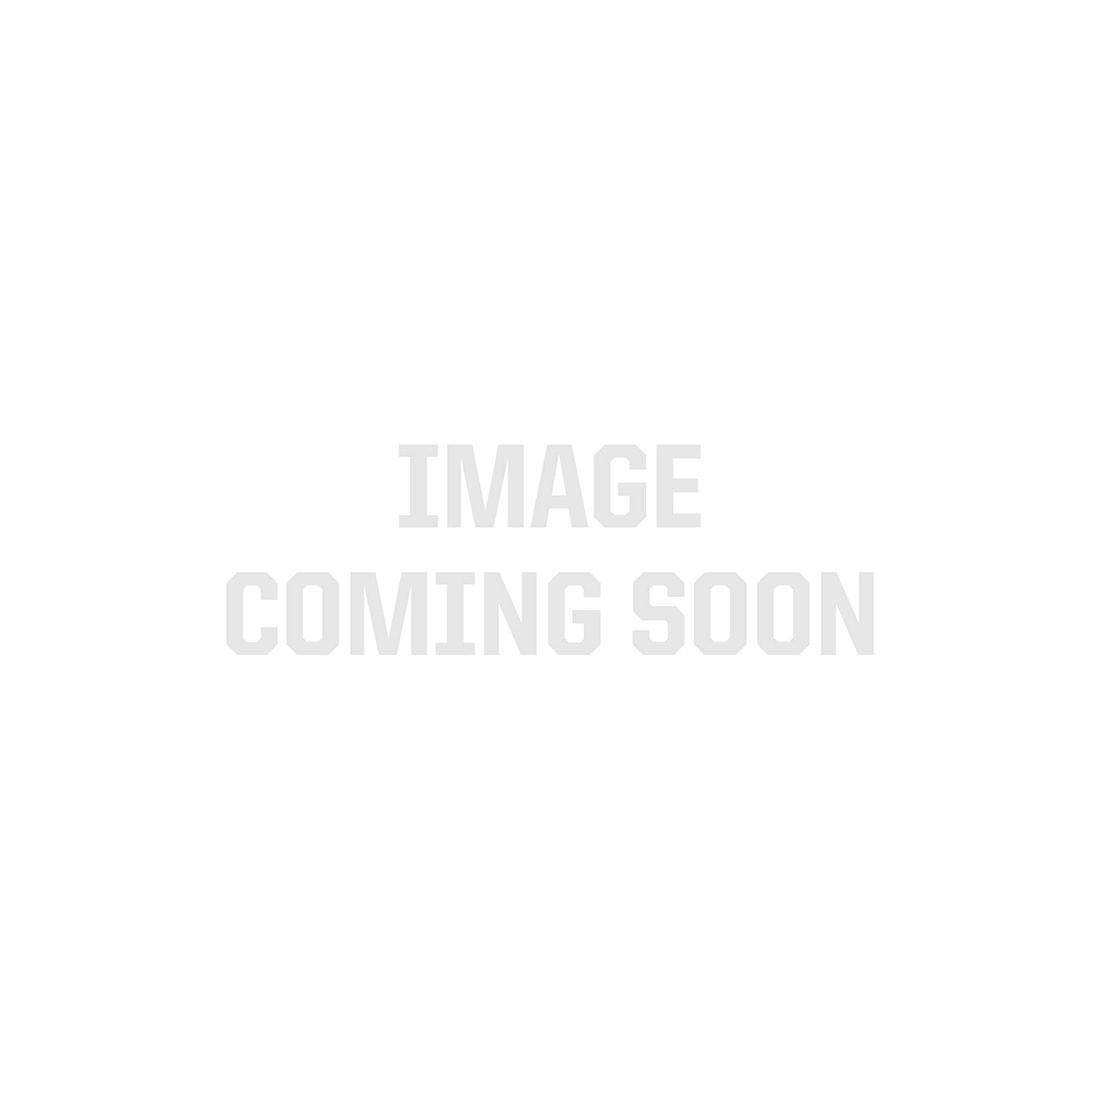 S14 Dimmable LED Christmas Light Bulb, E26 (Medium) Base, 0.96 watt (Warm White)